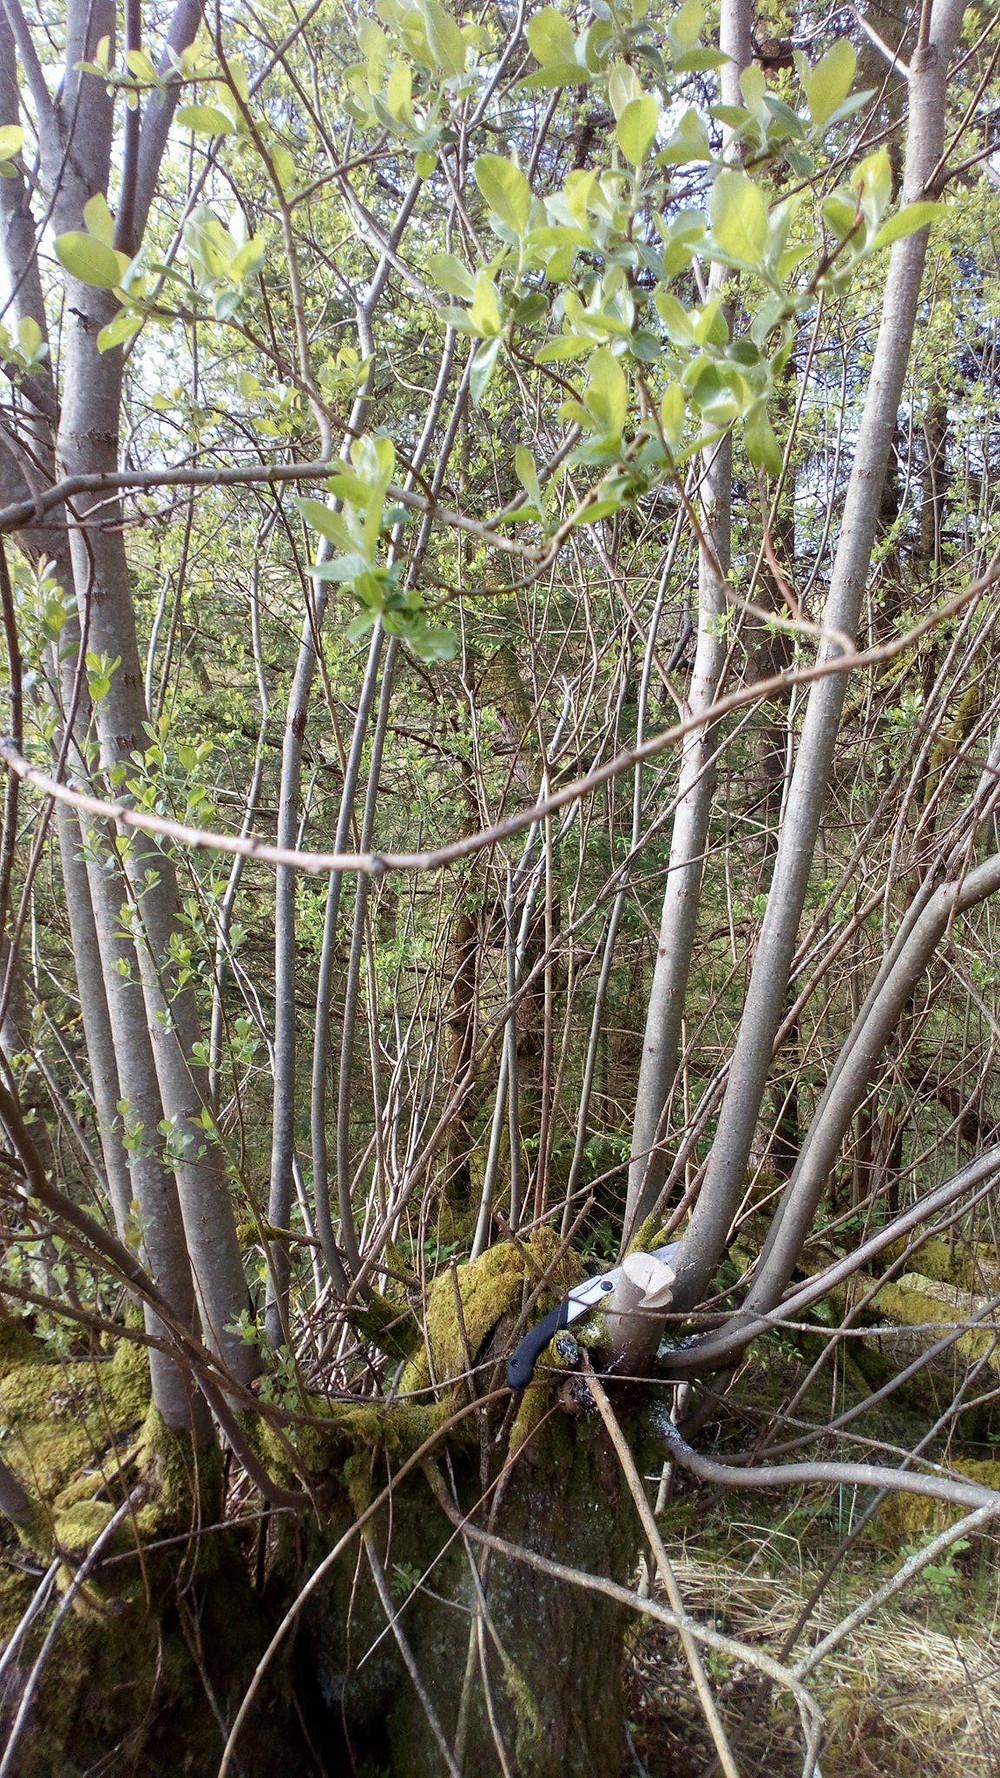 A low pollarded tree